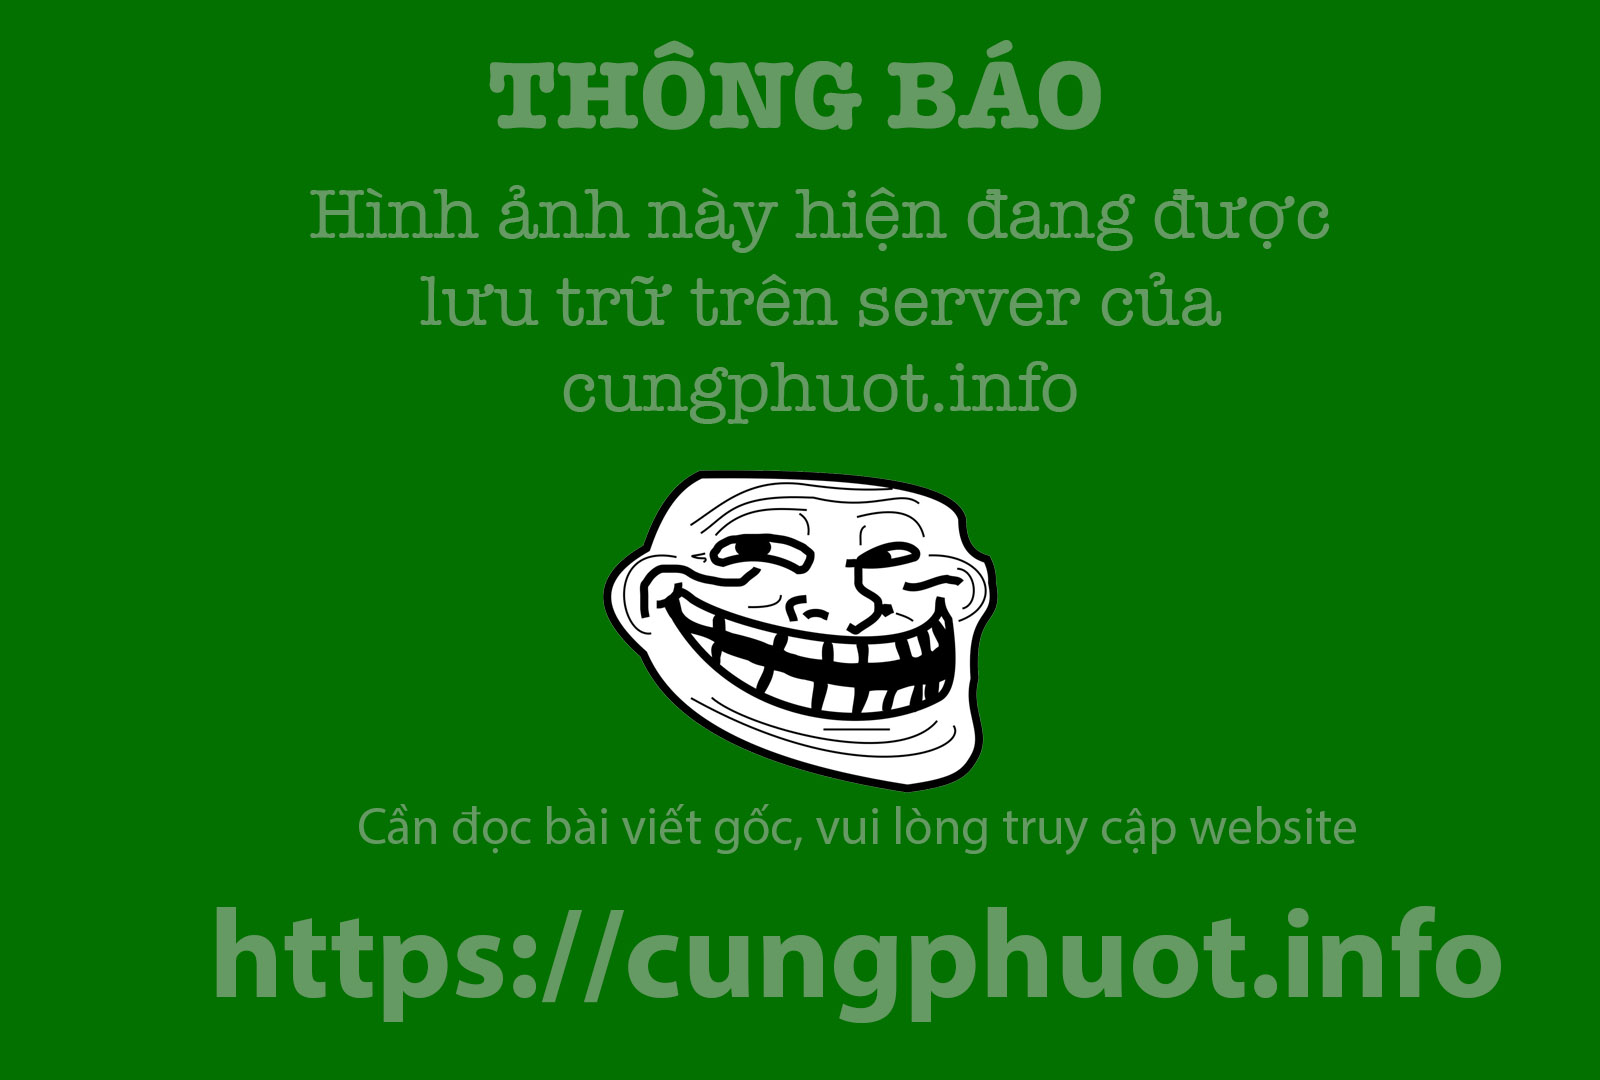 Ly Son: Nguon goc so khai va nhung dieu can thay doi hinh anh 4